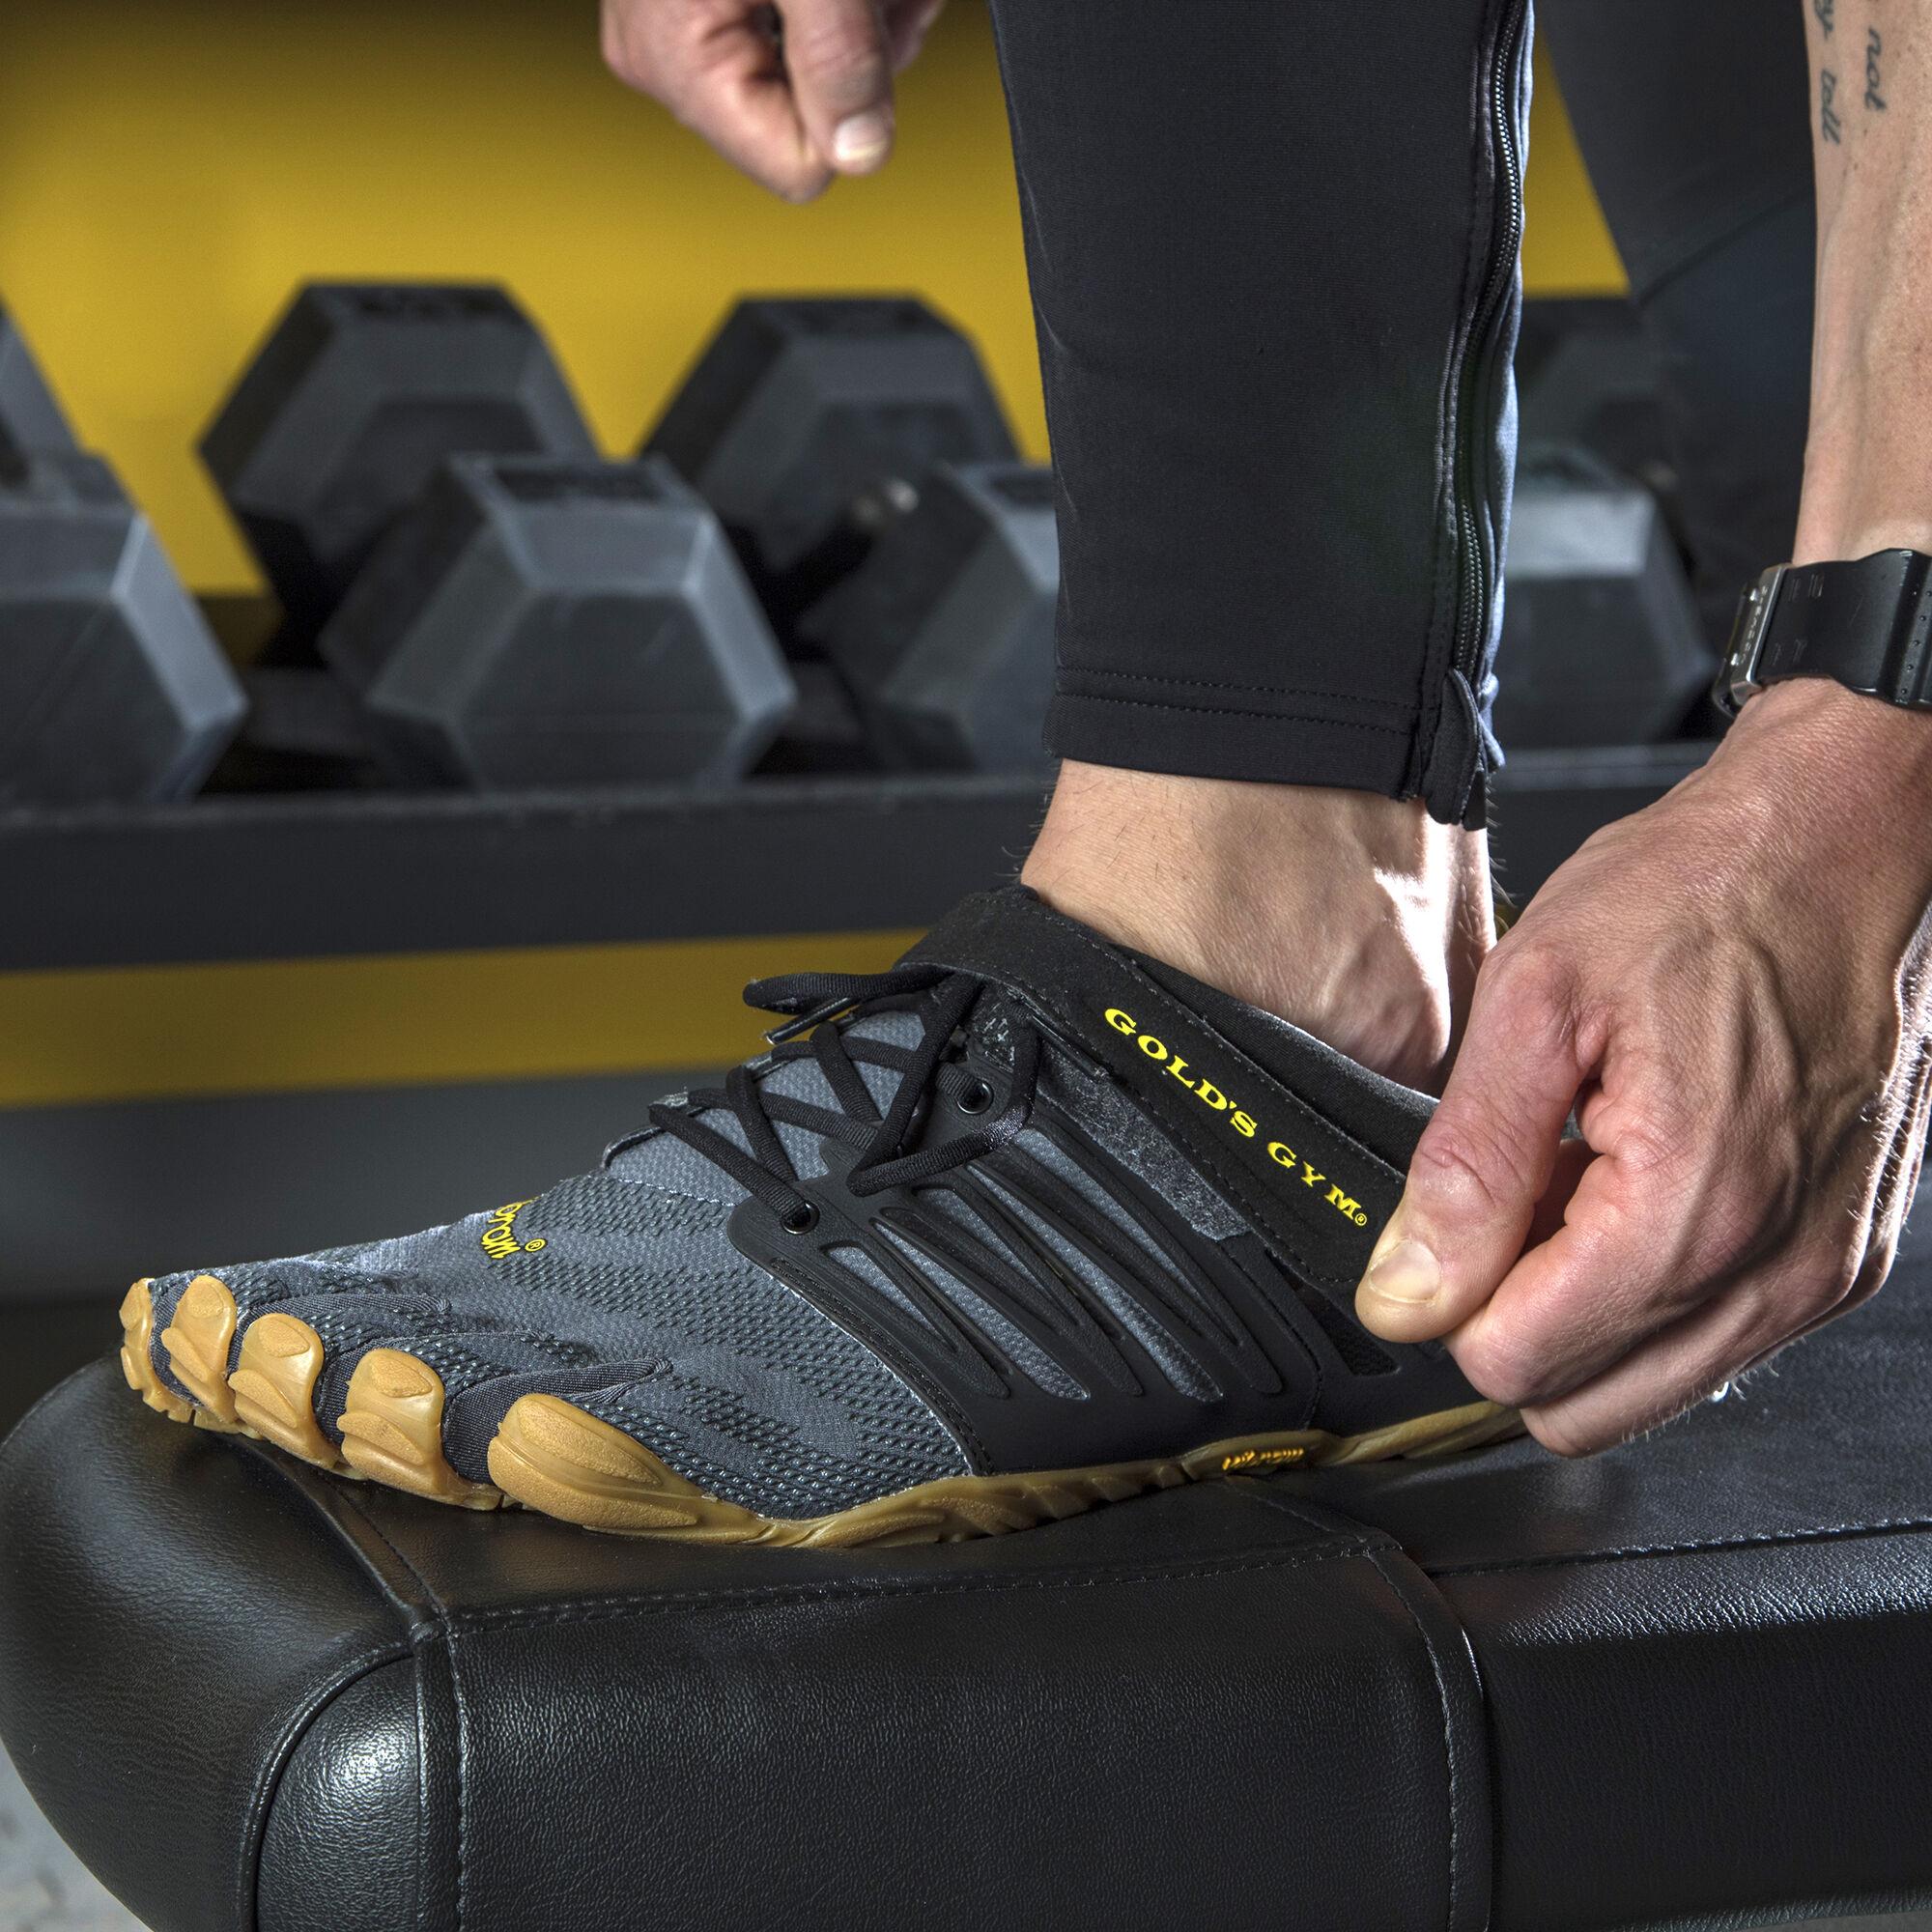 V-Train Men's Gold's Gym Edition